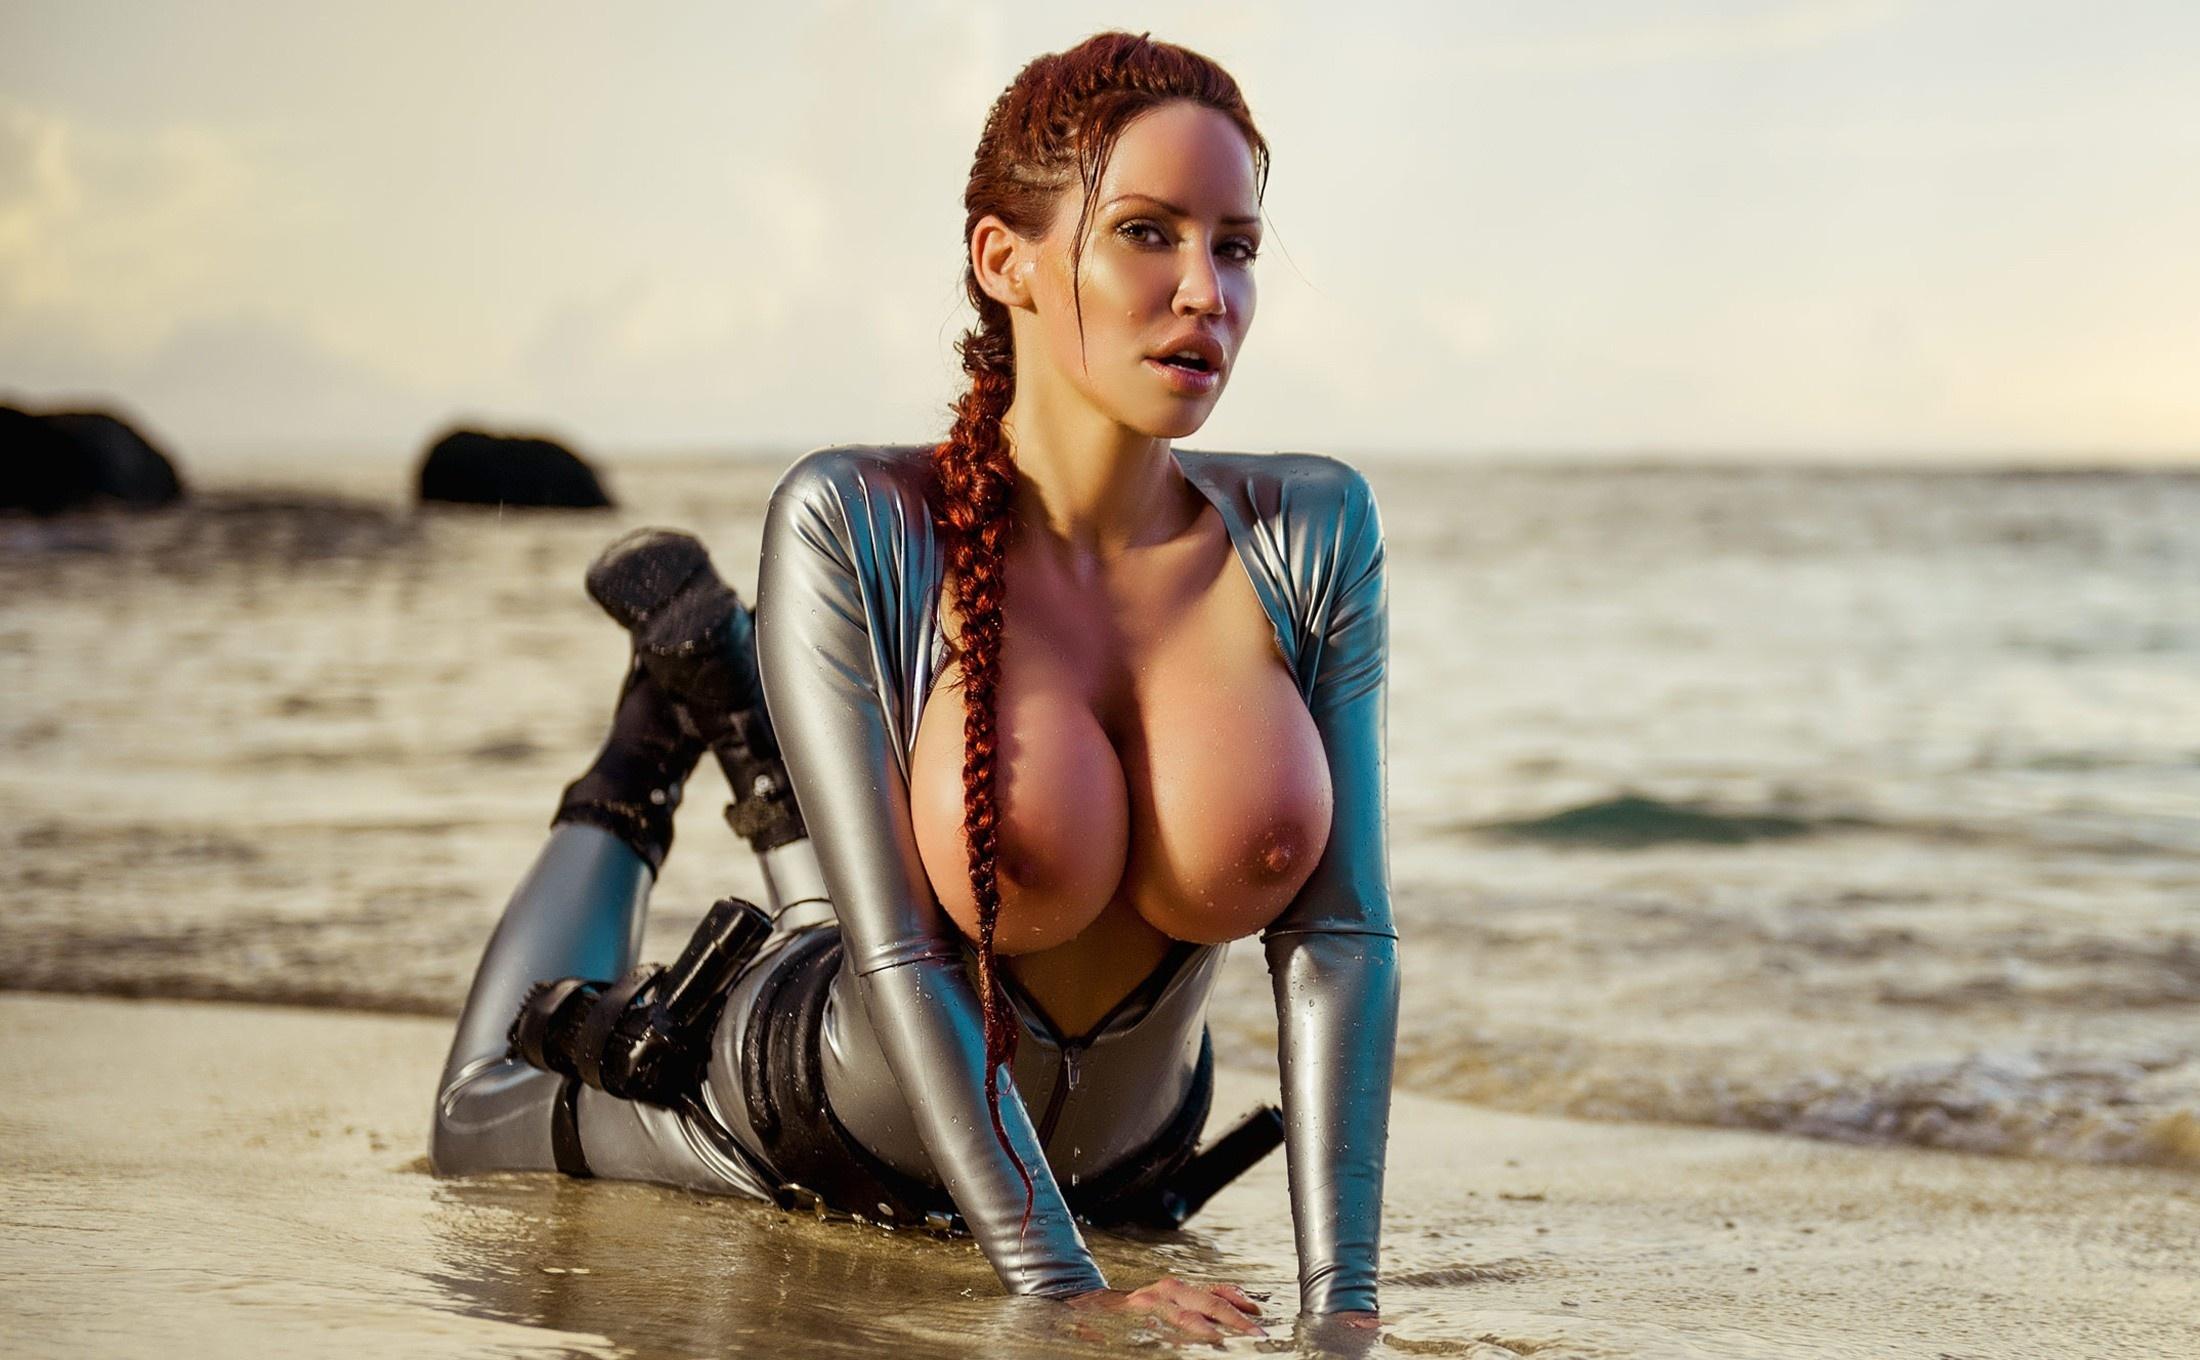 Lara croft naket picture nackt image